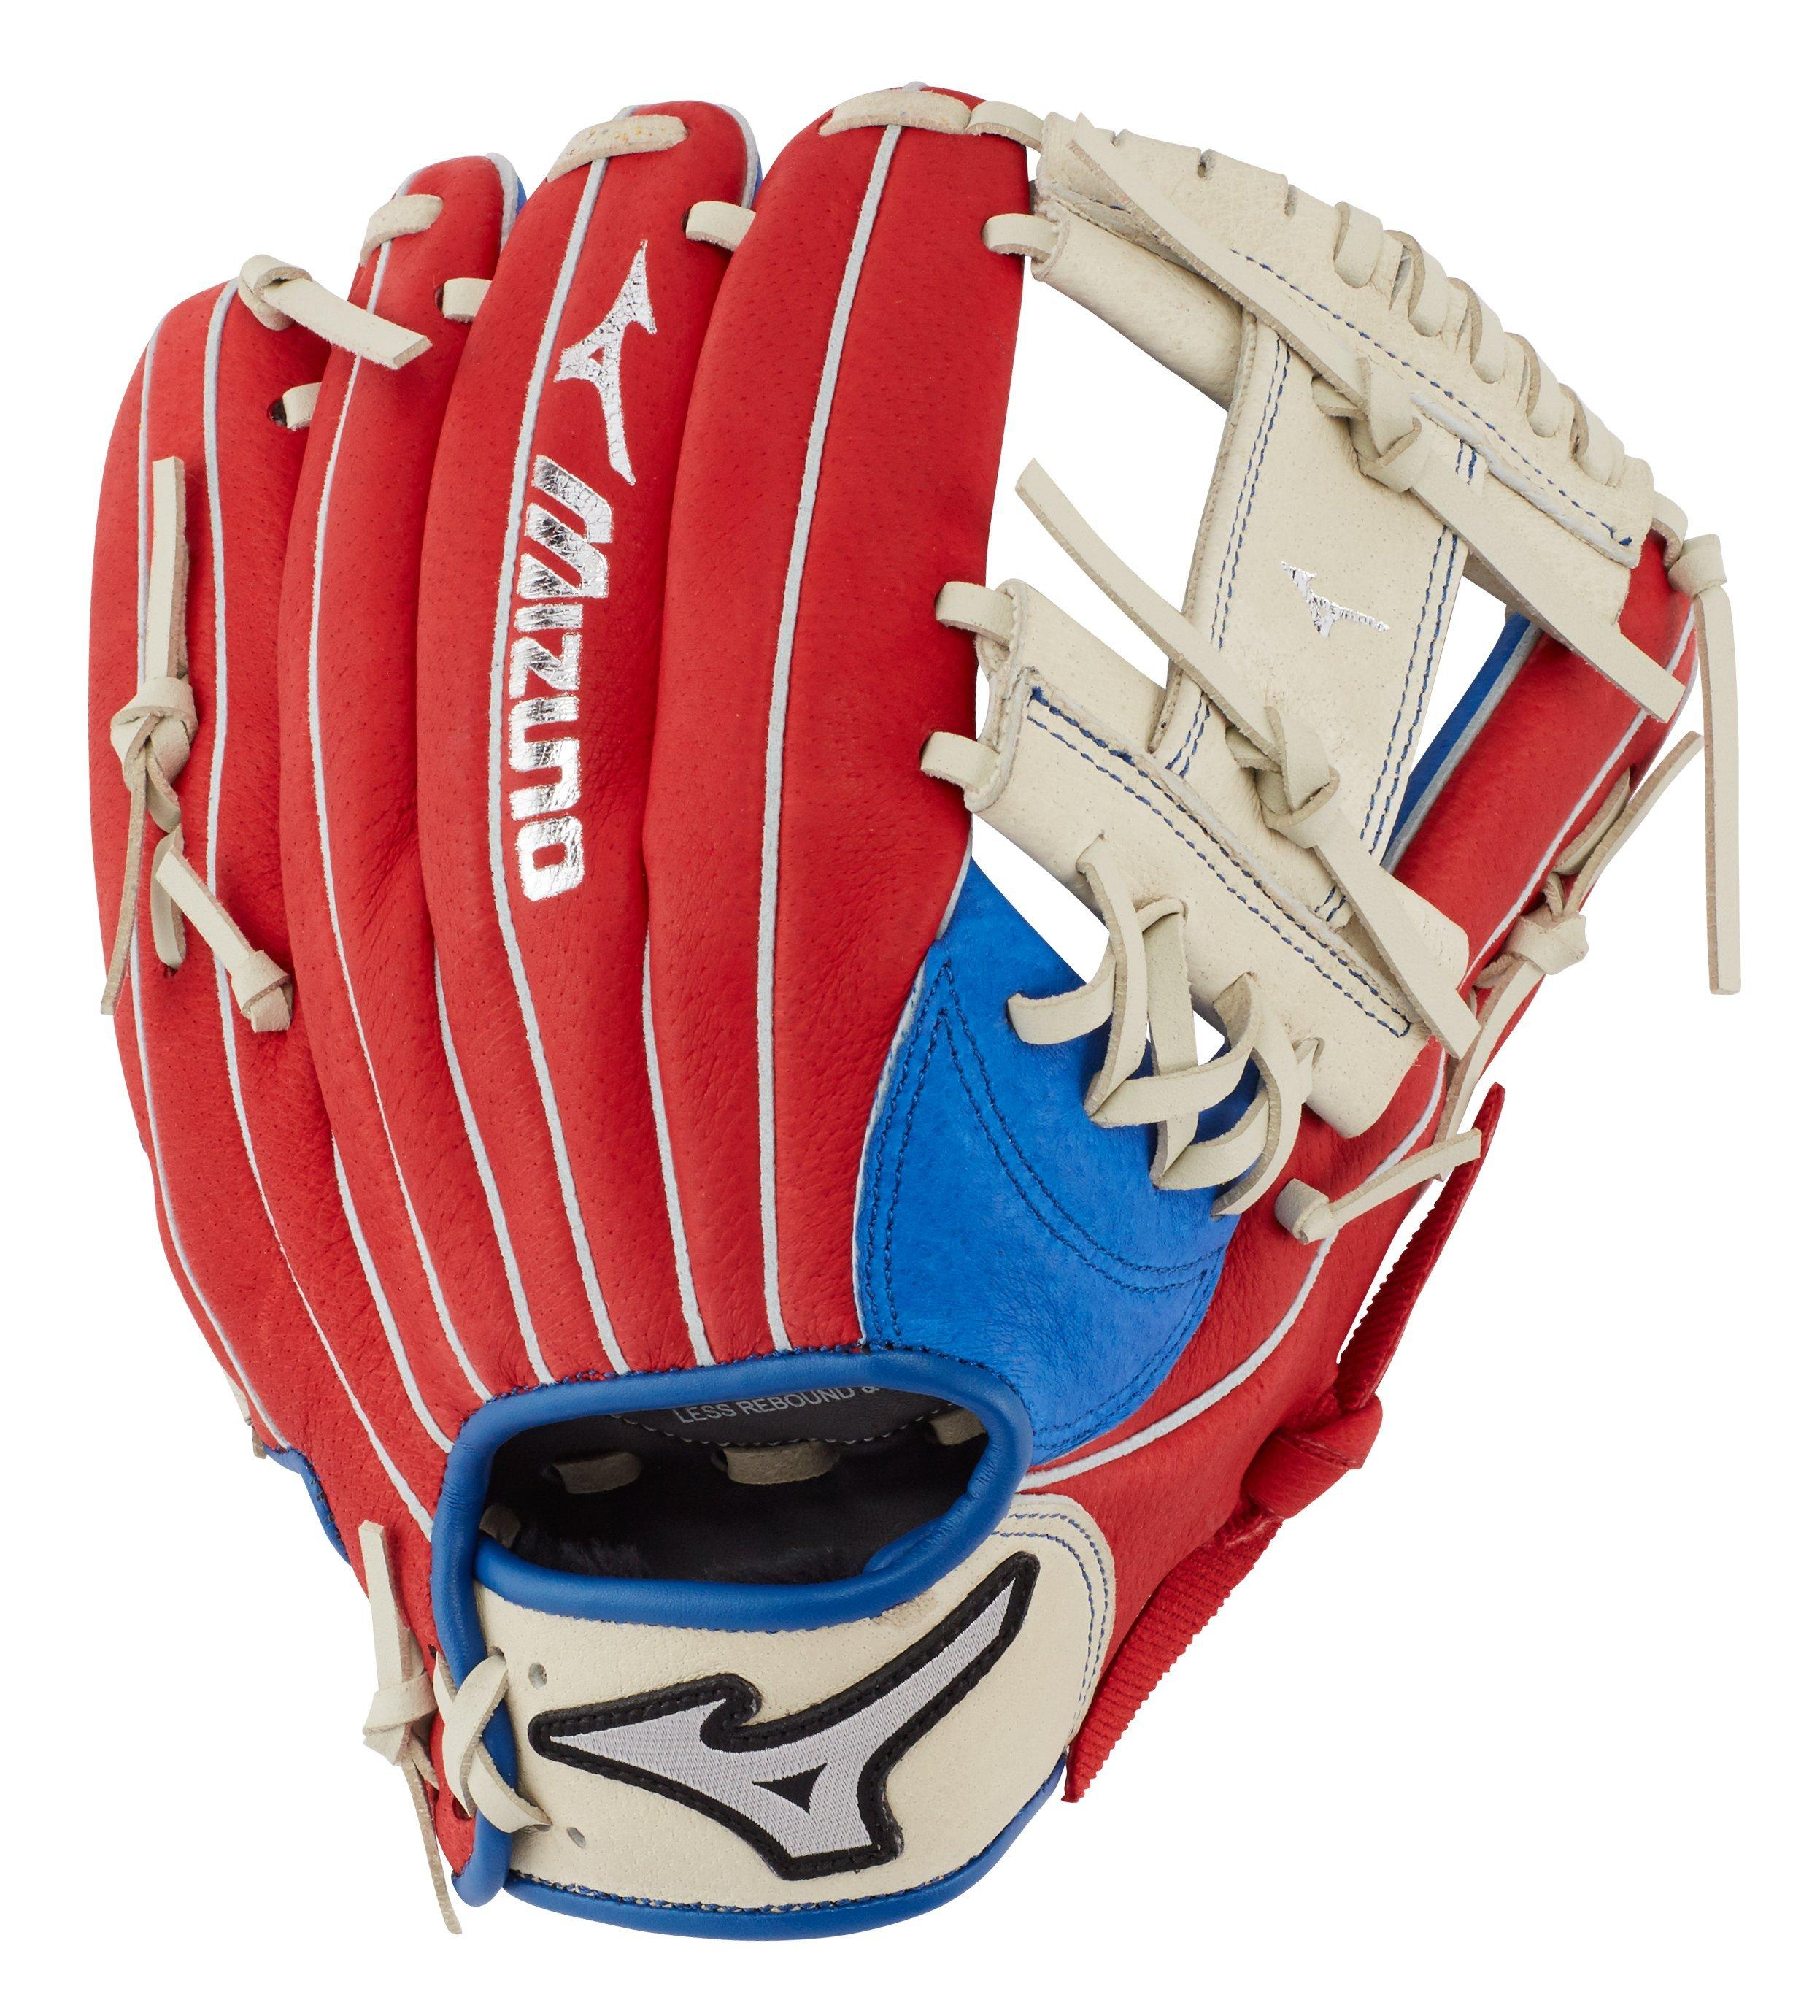 prospect series powerclose youth baseball glove 11